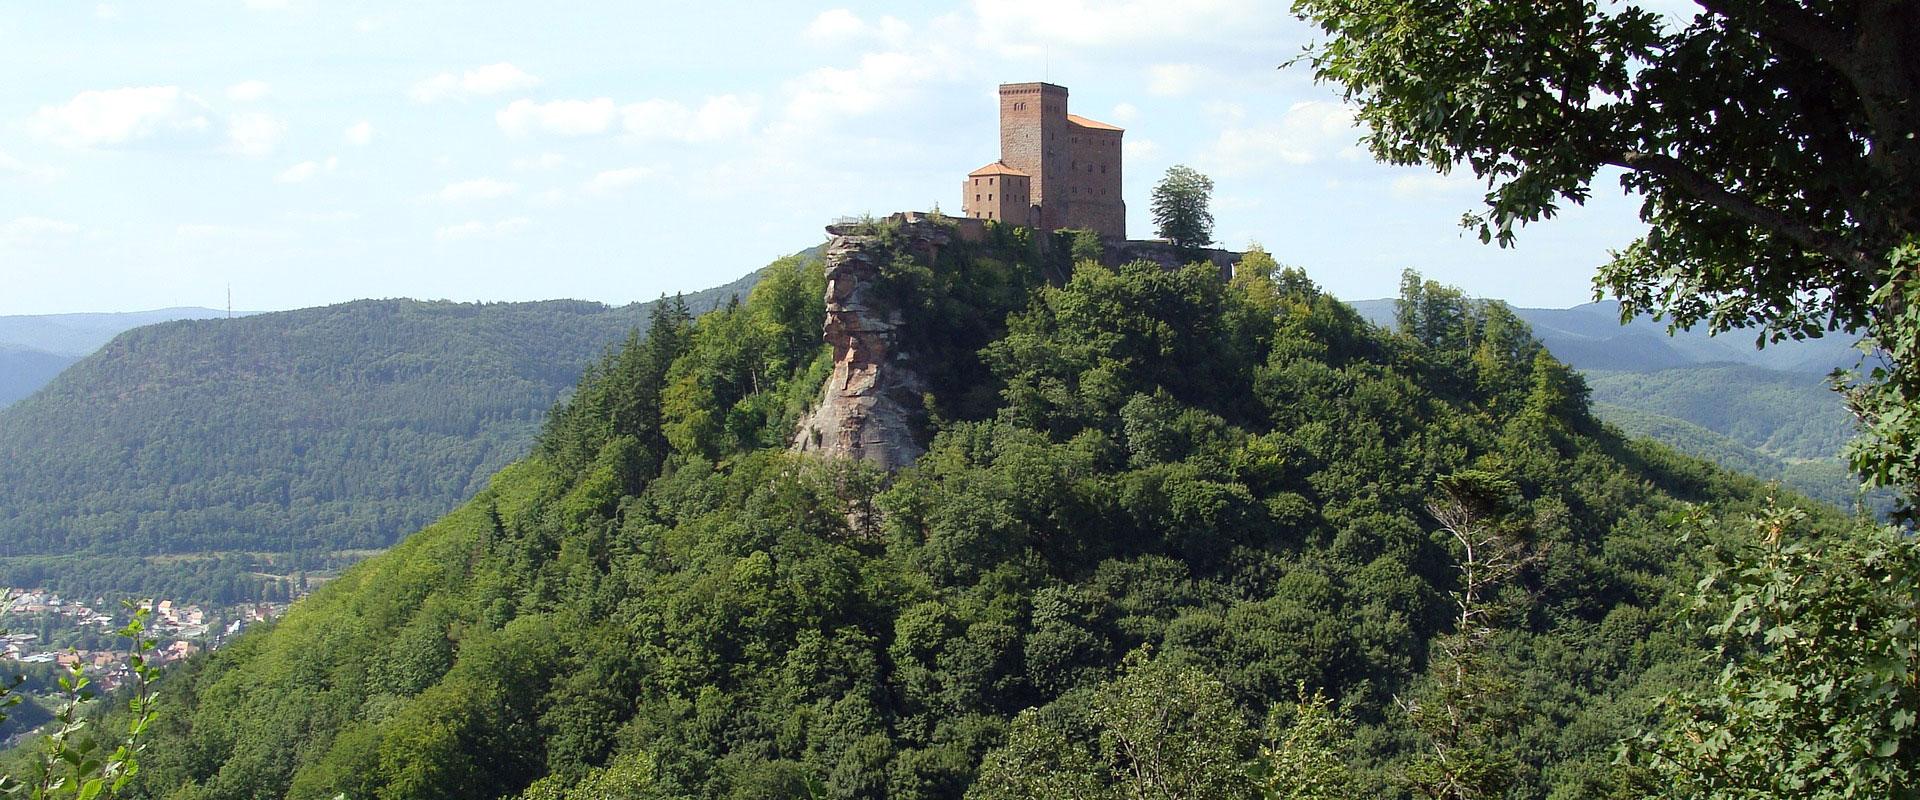 Pfälzer Wald - Burg Trifels